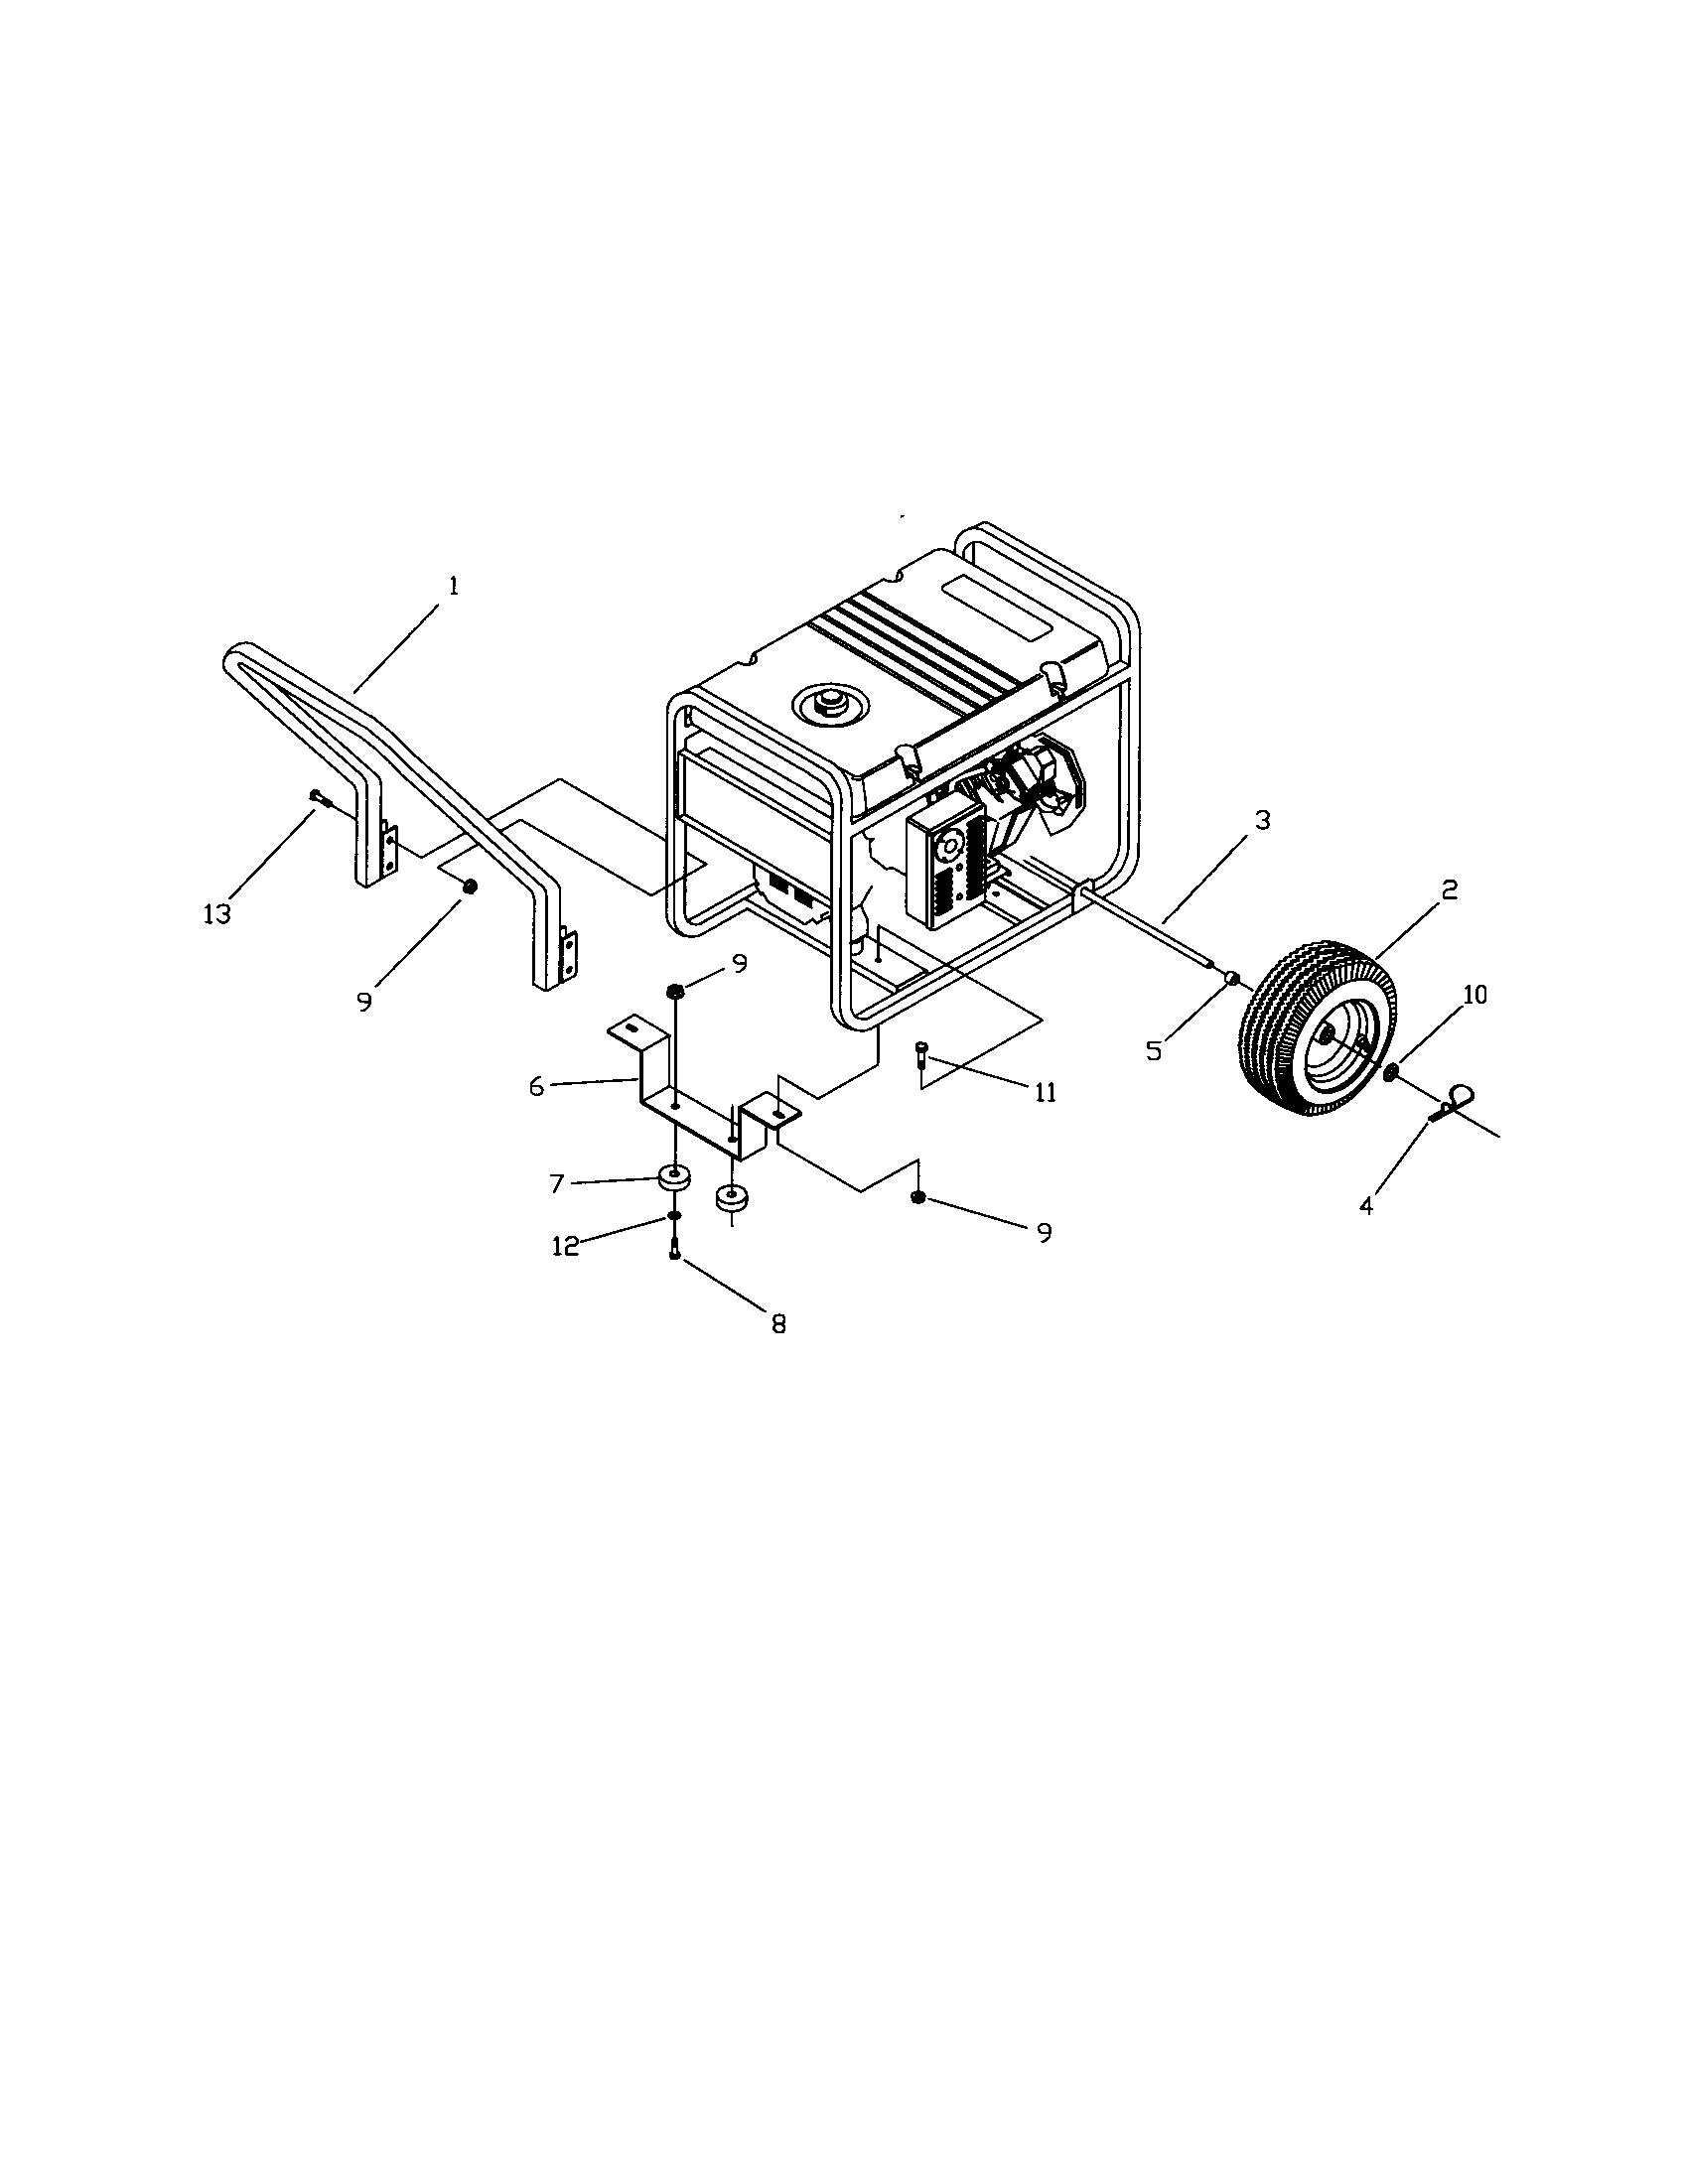 Craftsman Generac Generator Wiring Diagram Generac 5500XL